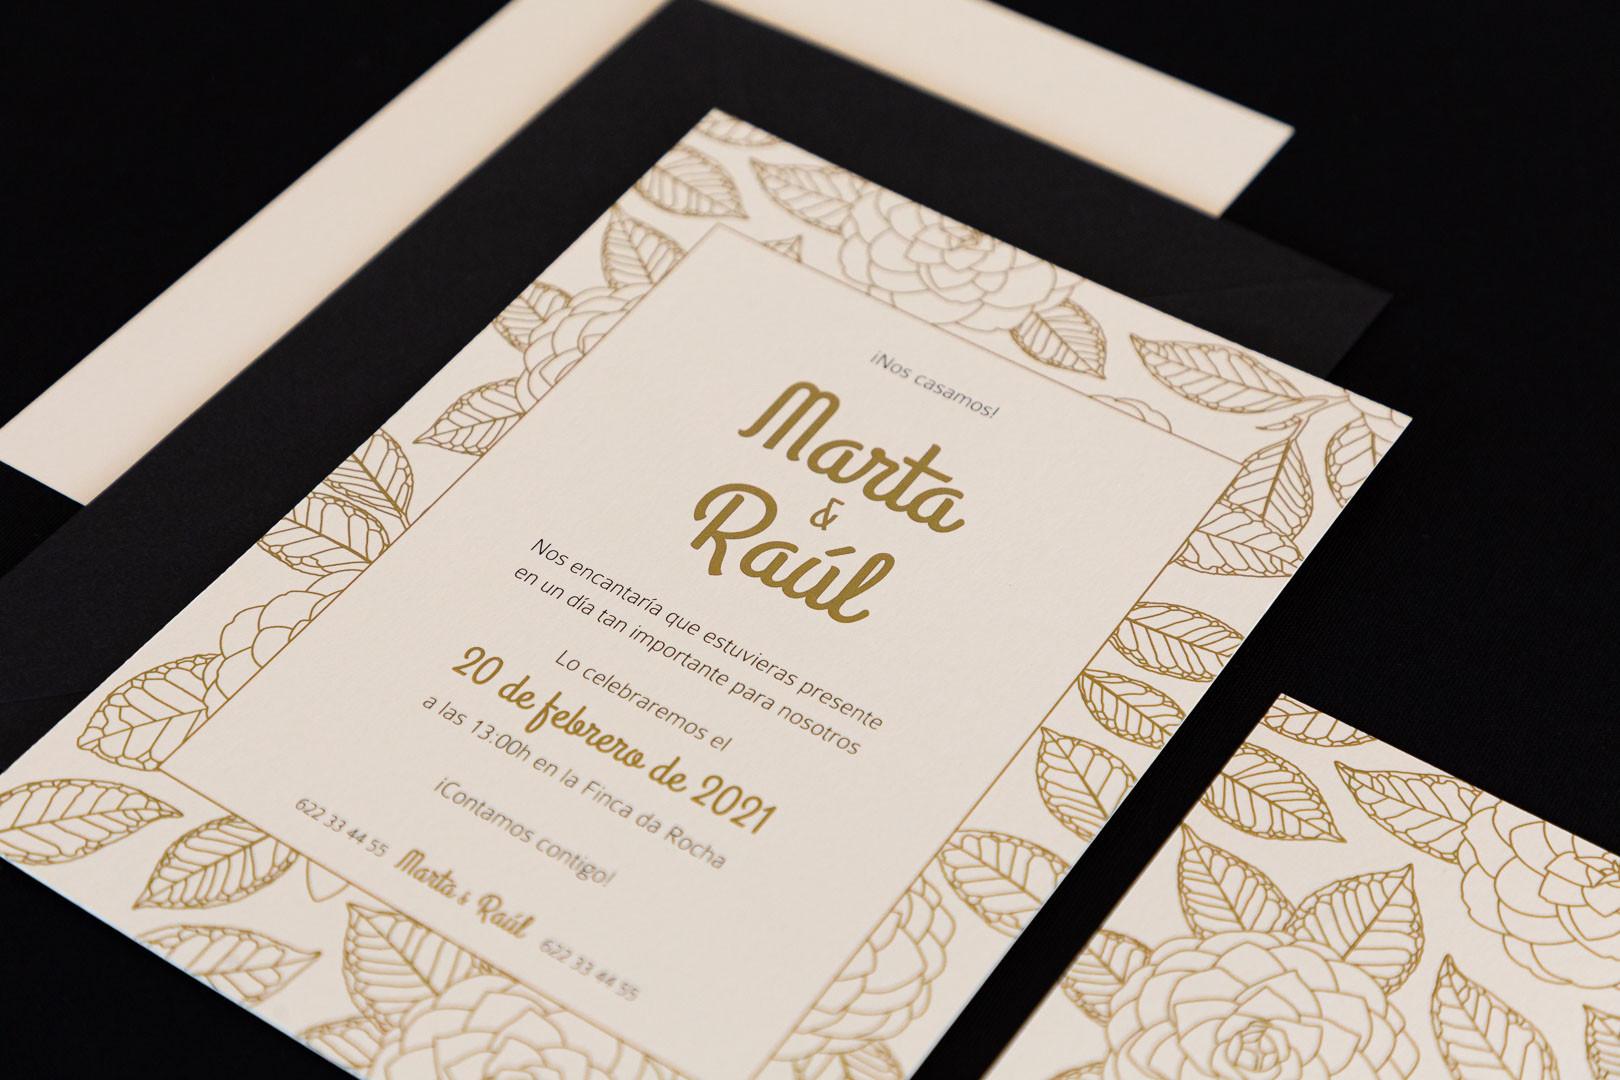 invitación de boda, invitacións de voda, invitación floral, invitación camelia, invitación elegante, estudio de diseño gráfico creativo